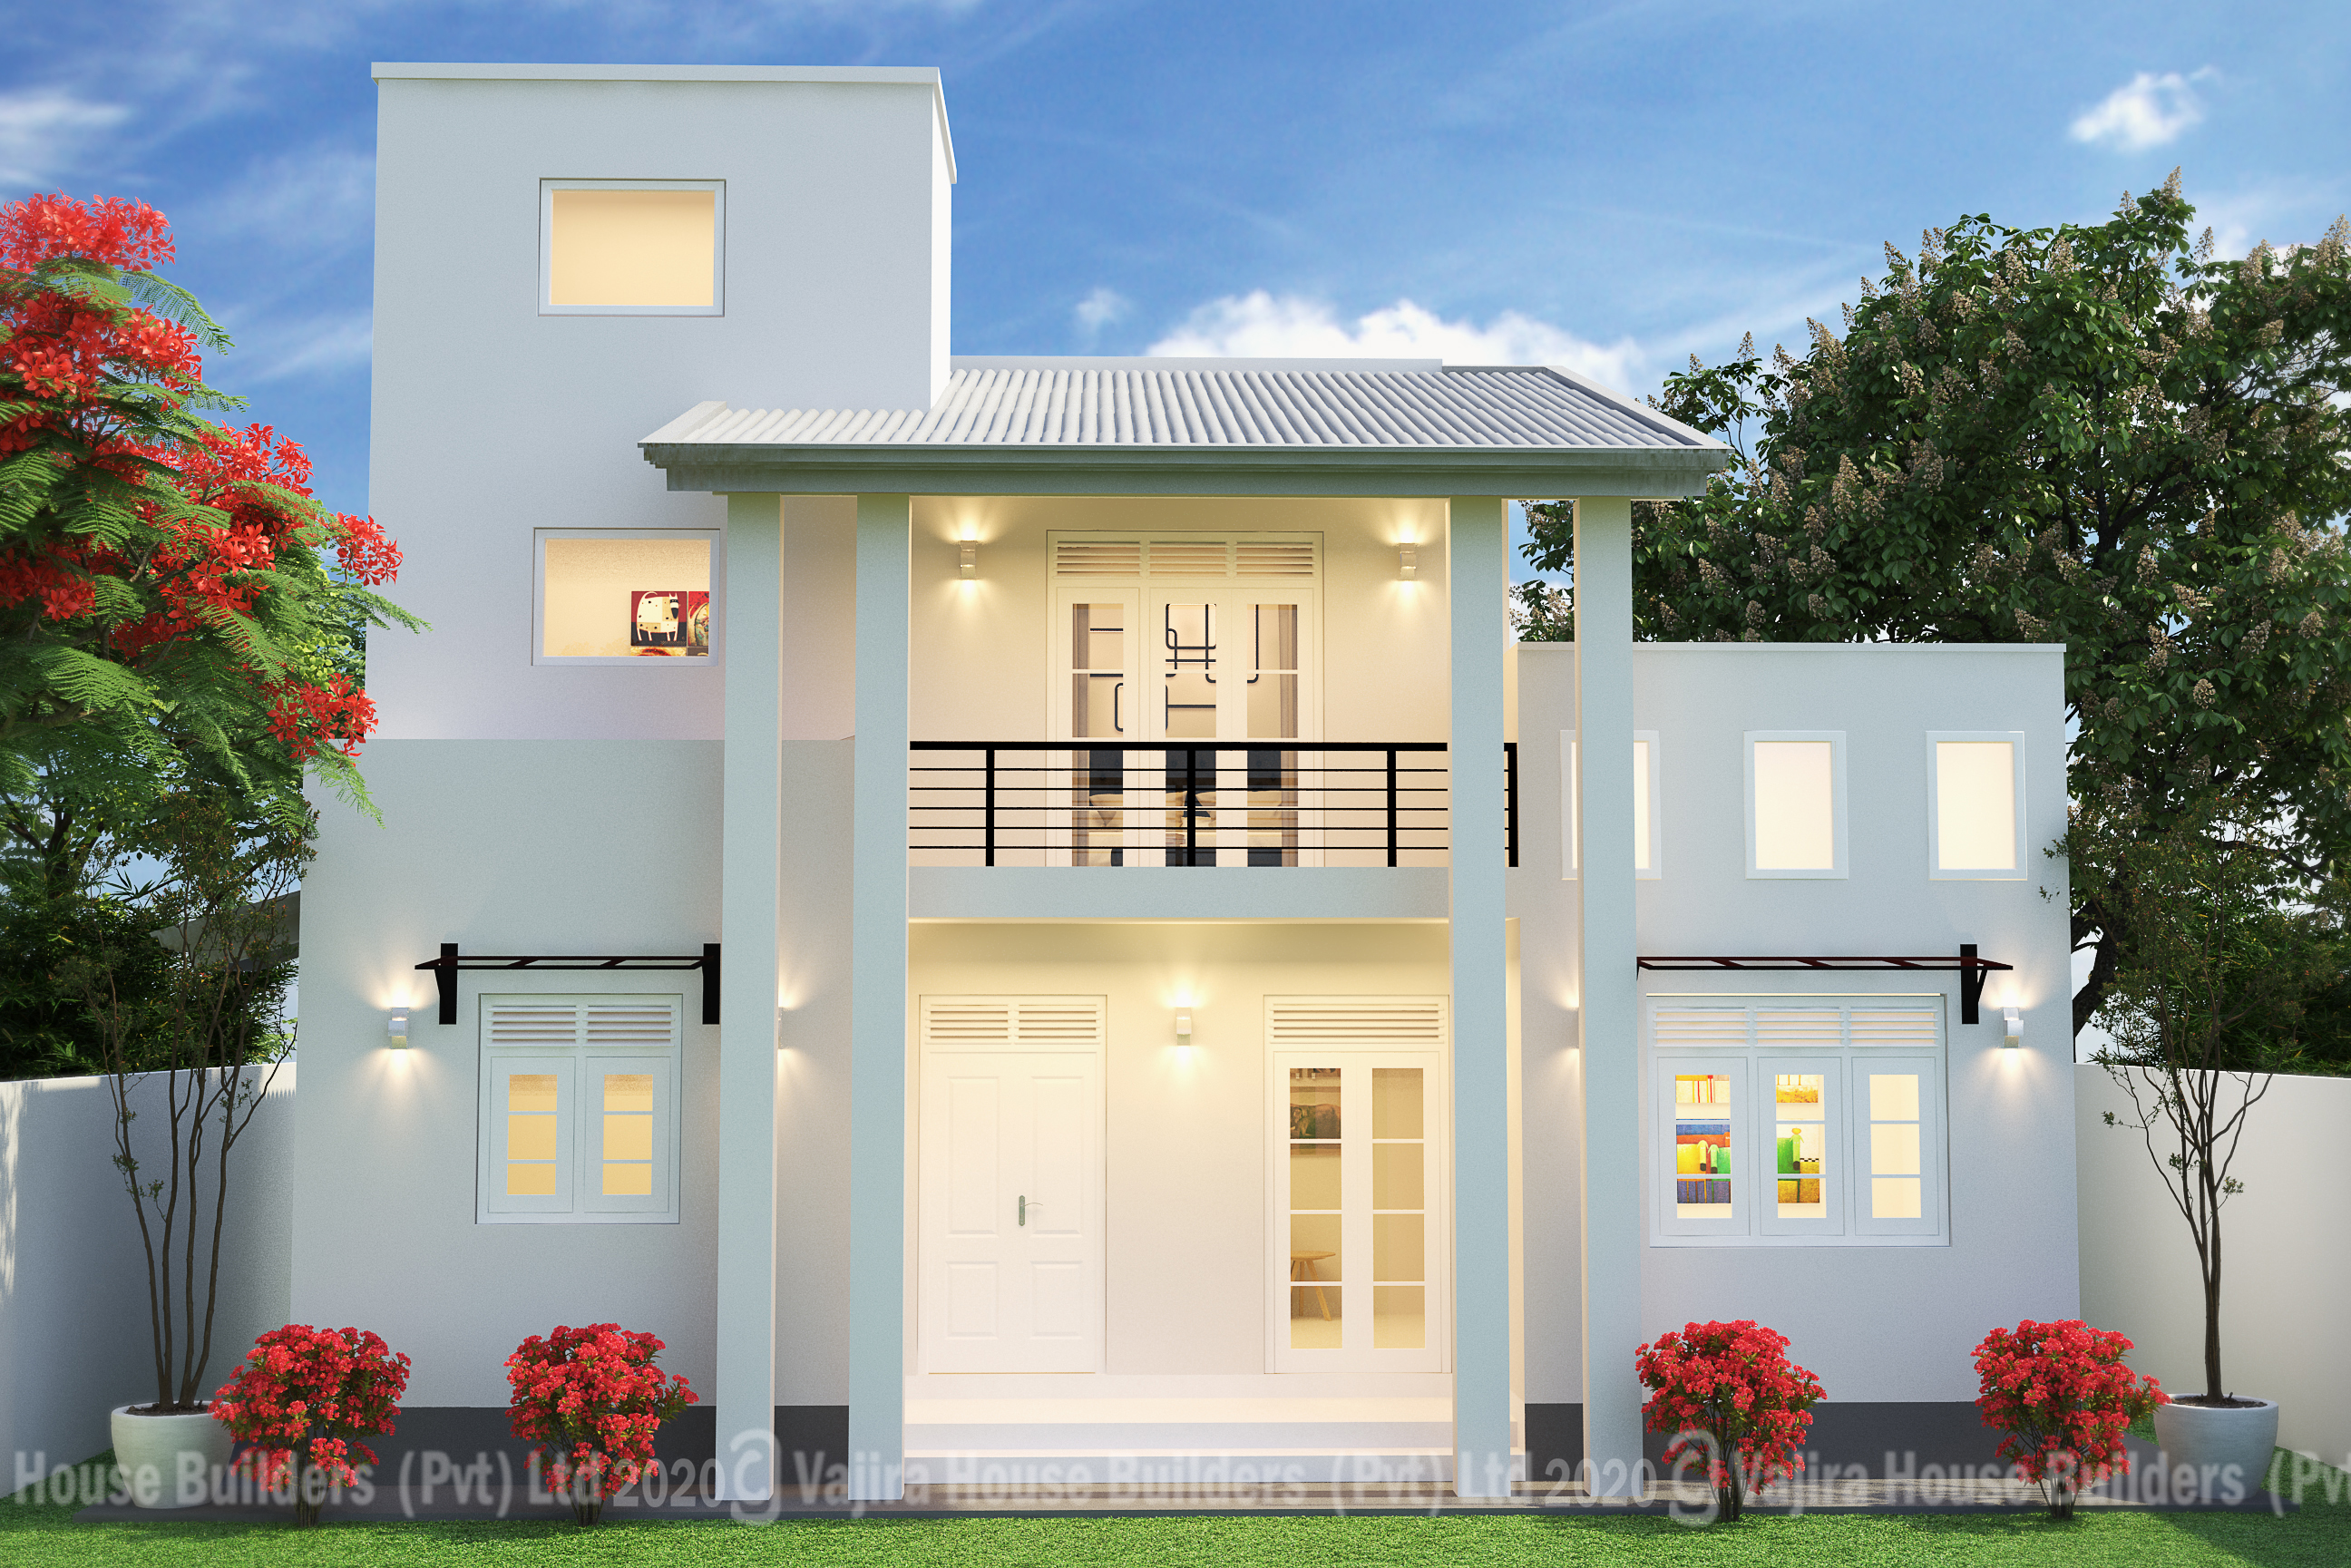 Two Storey Stories Vajira House Best House Builders Sri Lanka Building Construction